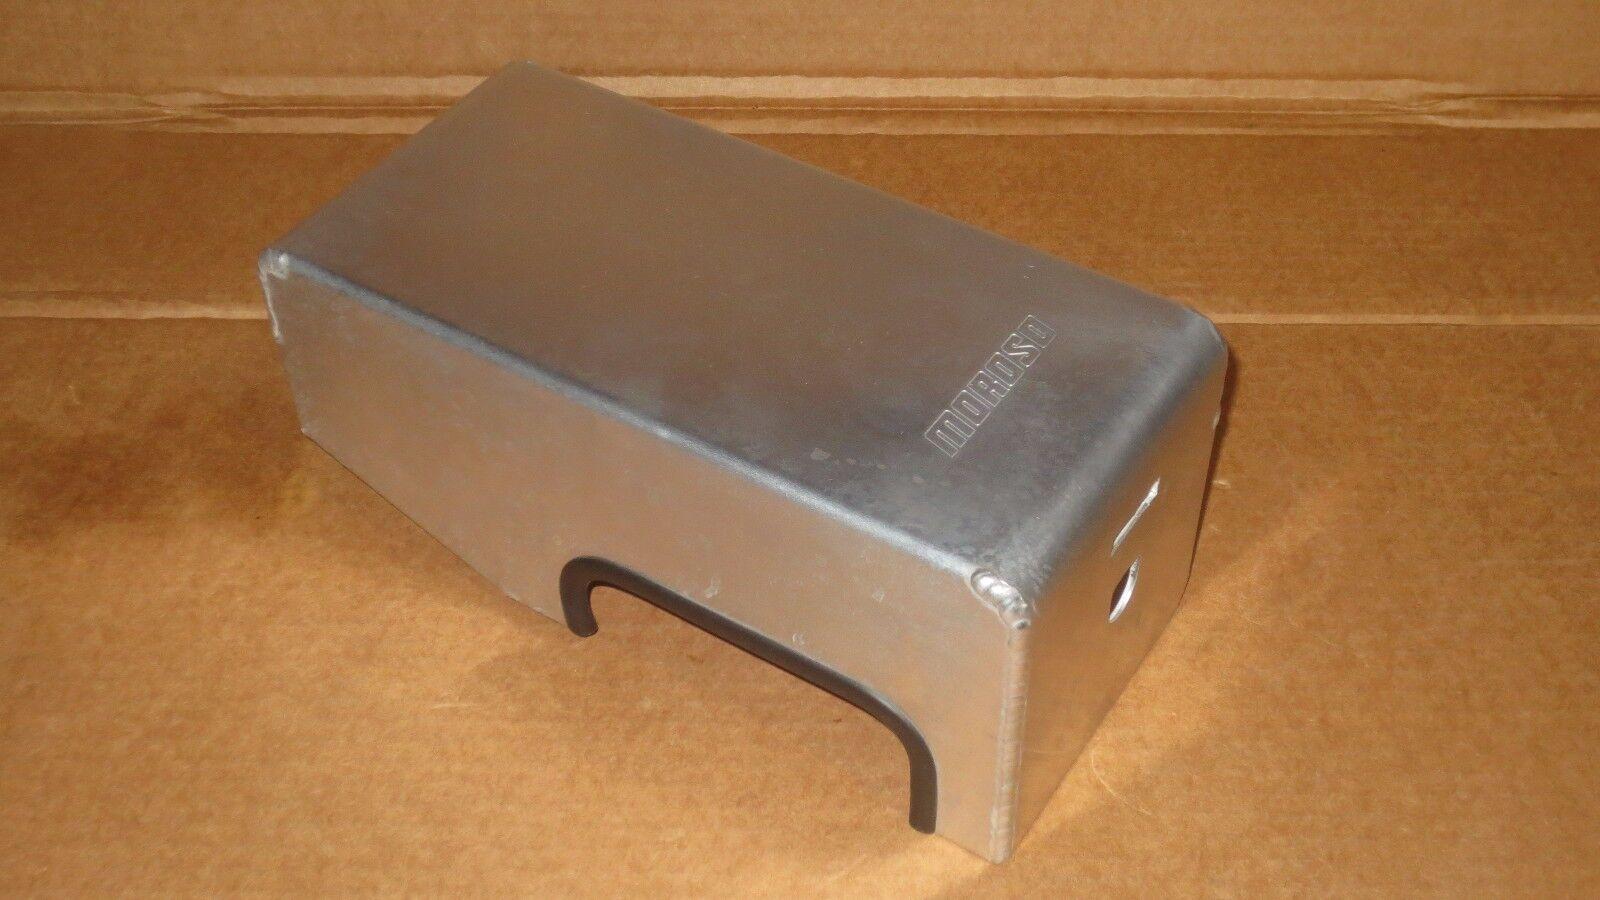 2005 2009 Ford Mustang Gt Moroso Billet Aluminum Fuse Box Cover Ebay